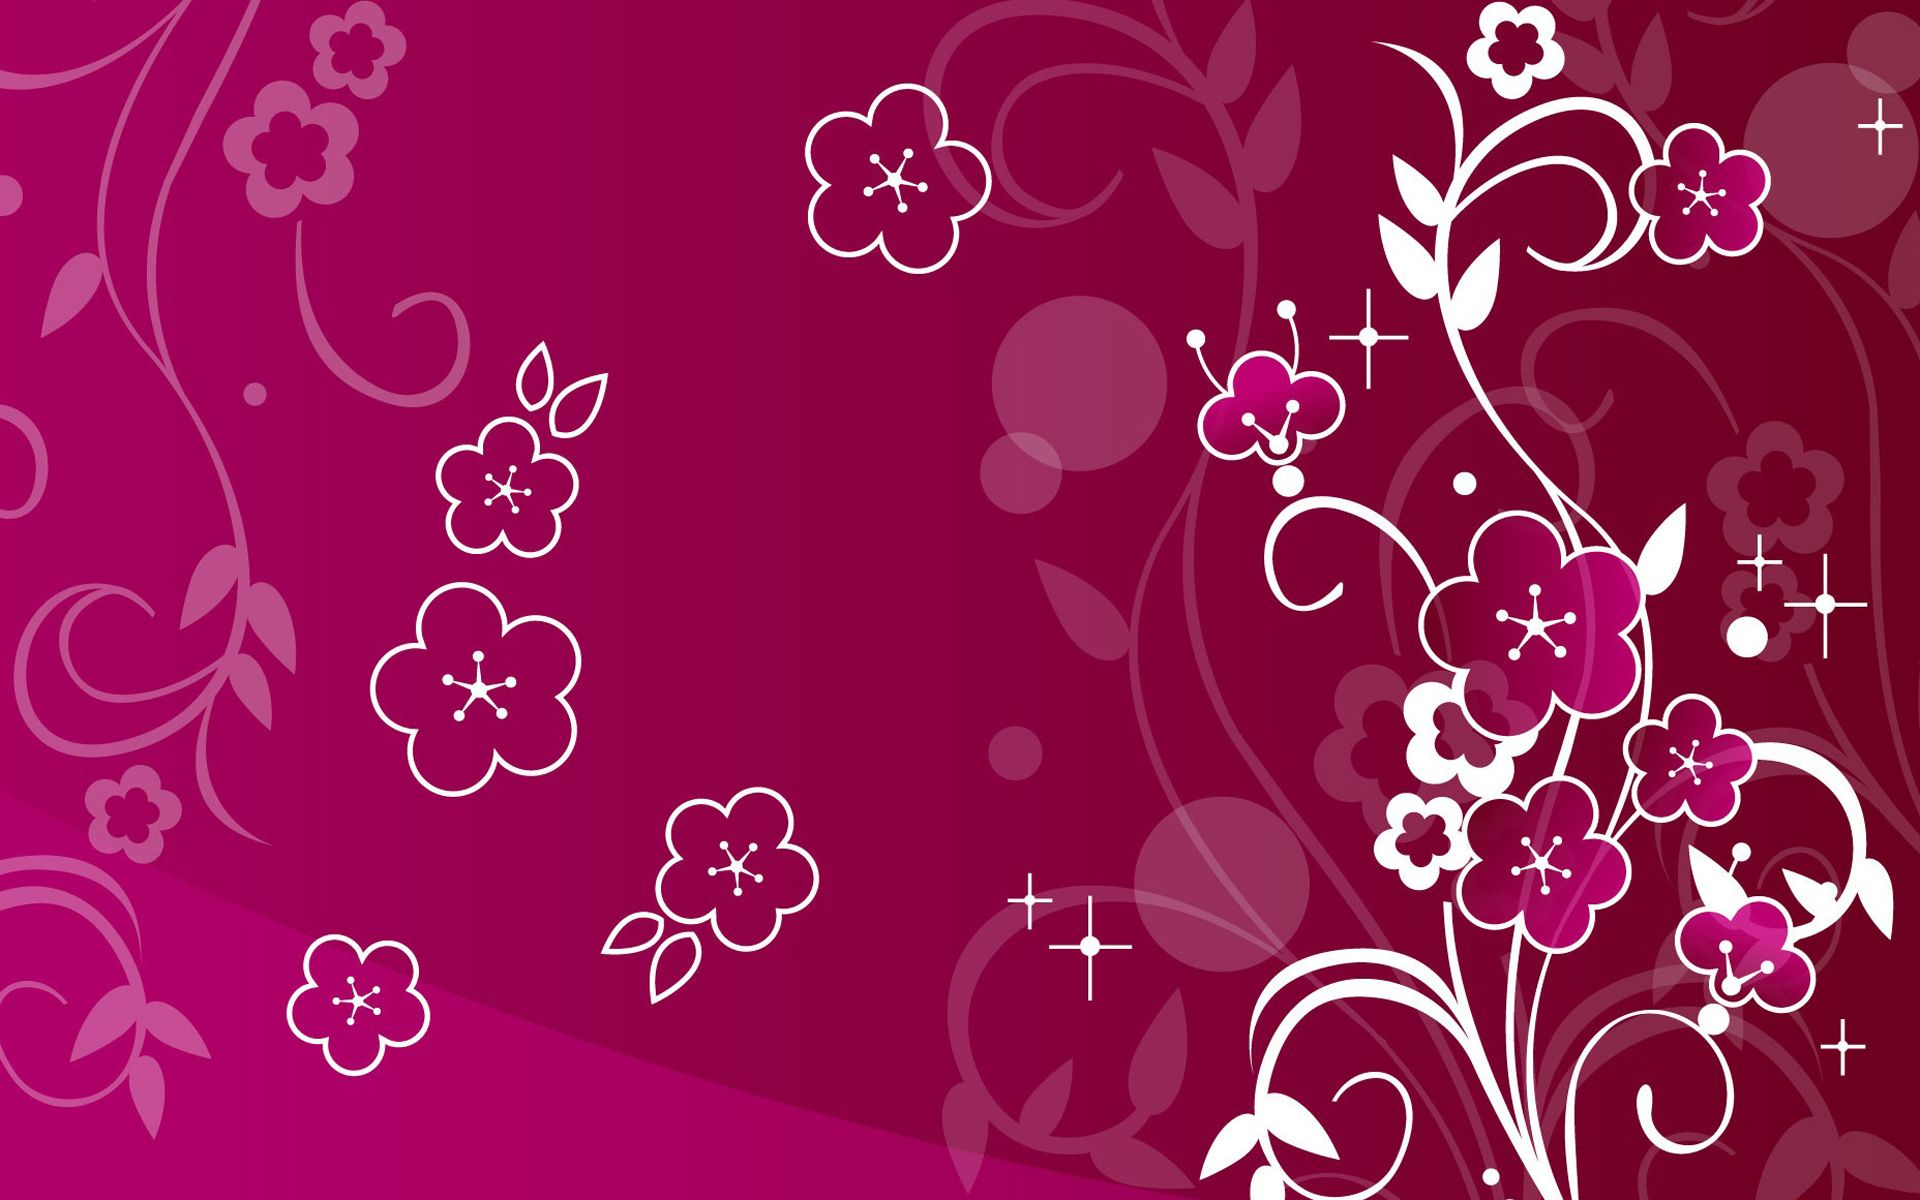 Download 77 Wallpaper Android Bunga HD Gratid